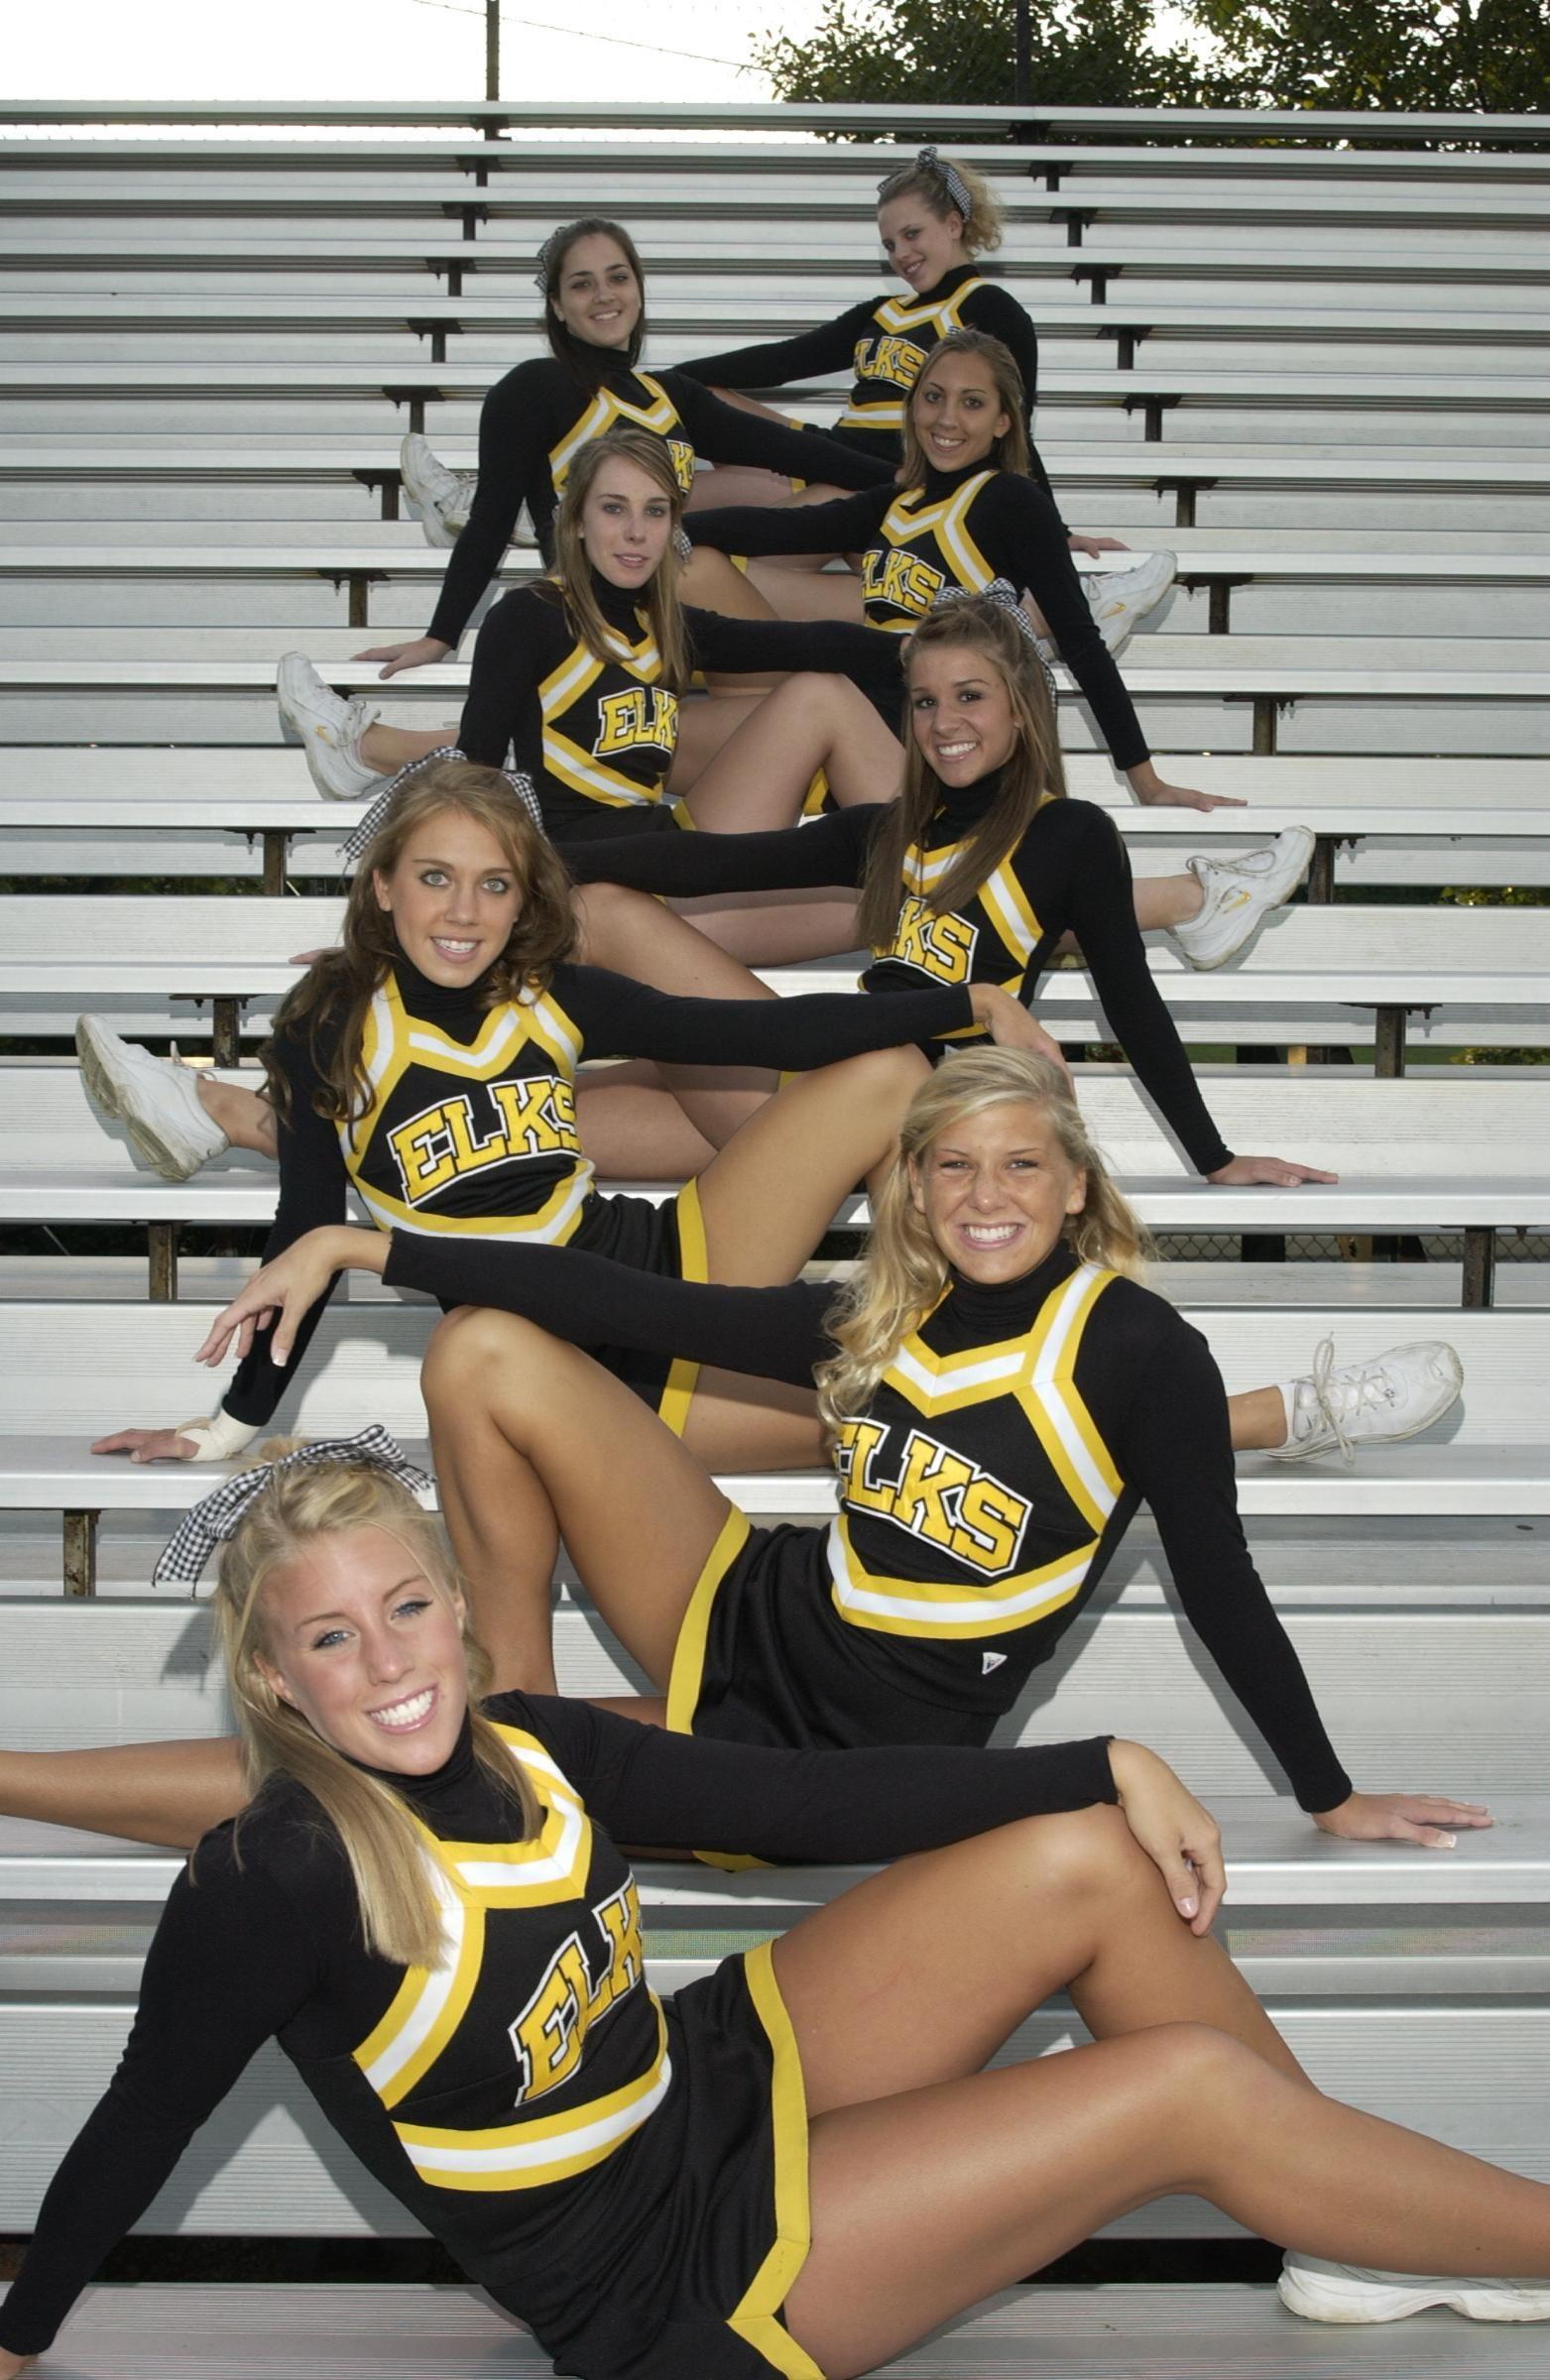 Cheer Team Cheerleading Photography School Team Pose Cheerleaders Cheer Squad Pictures Cheer Poses Cheer Photography